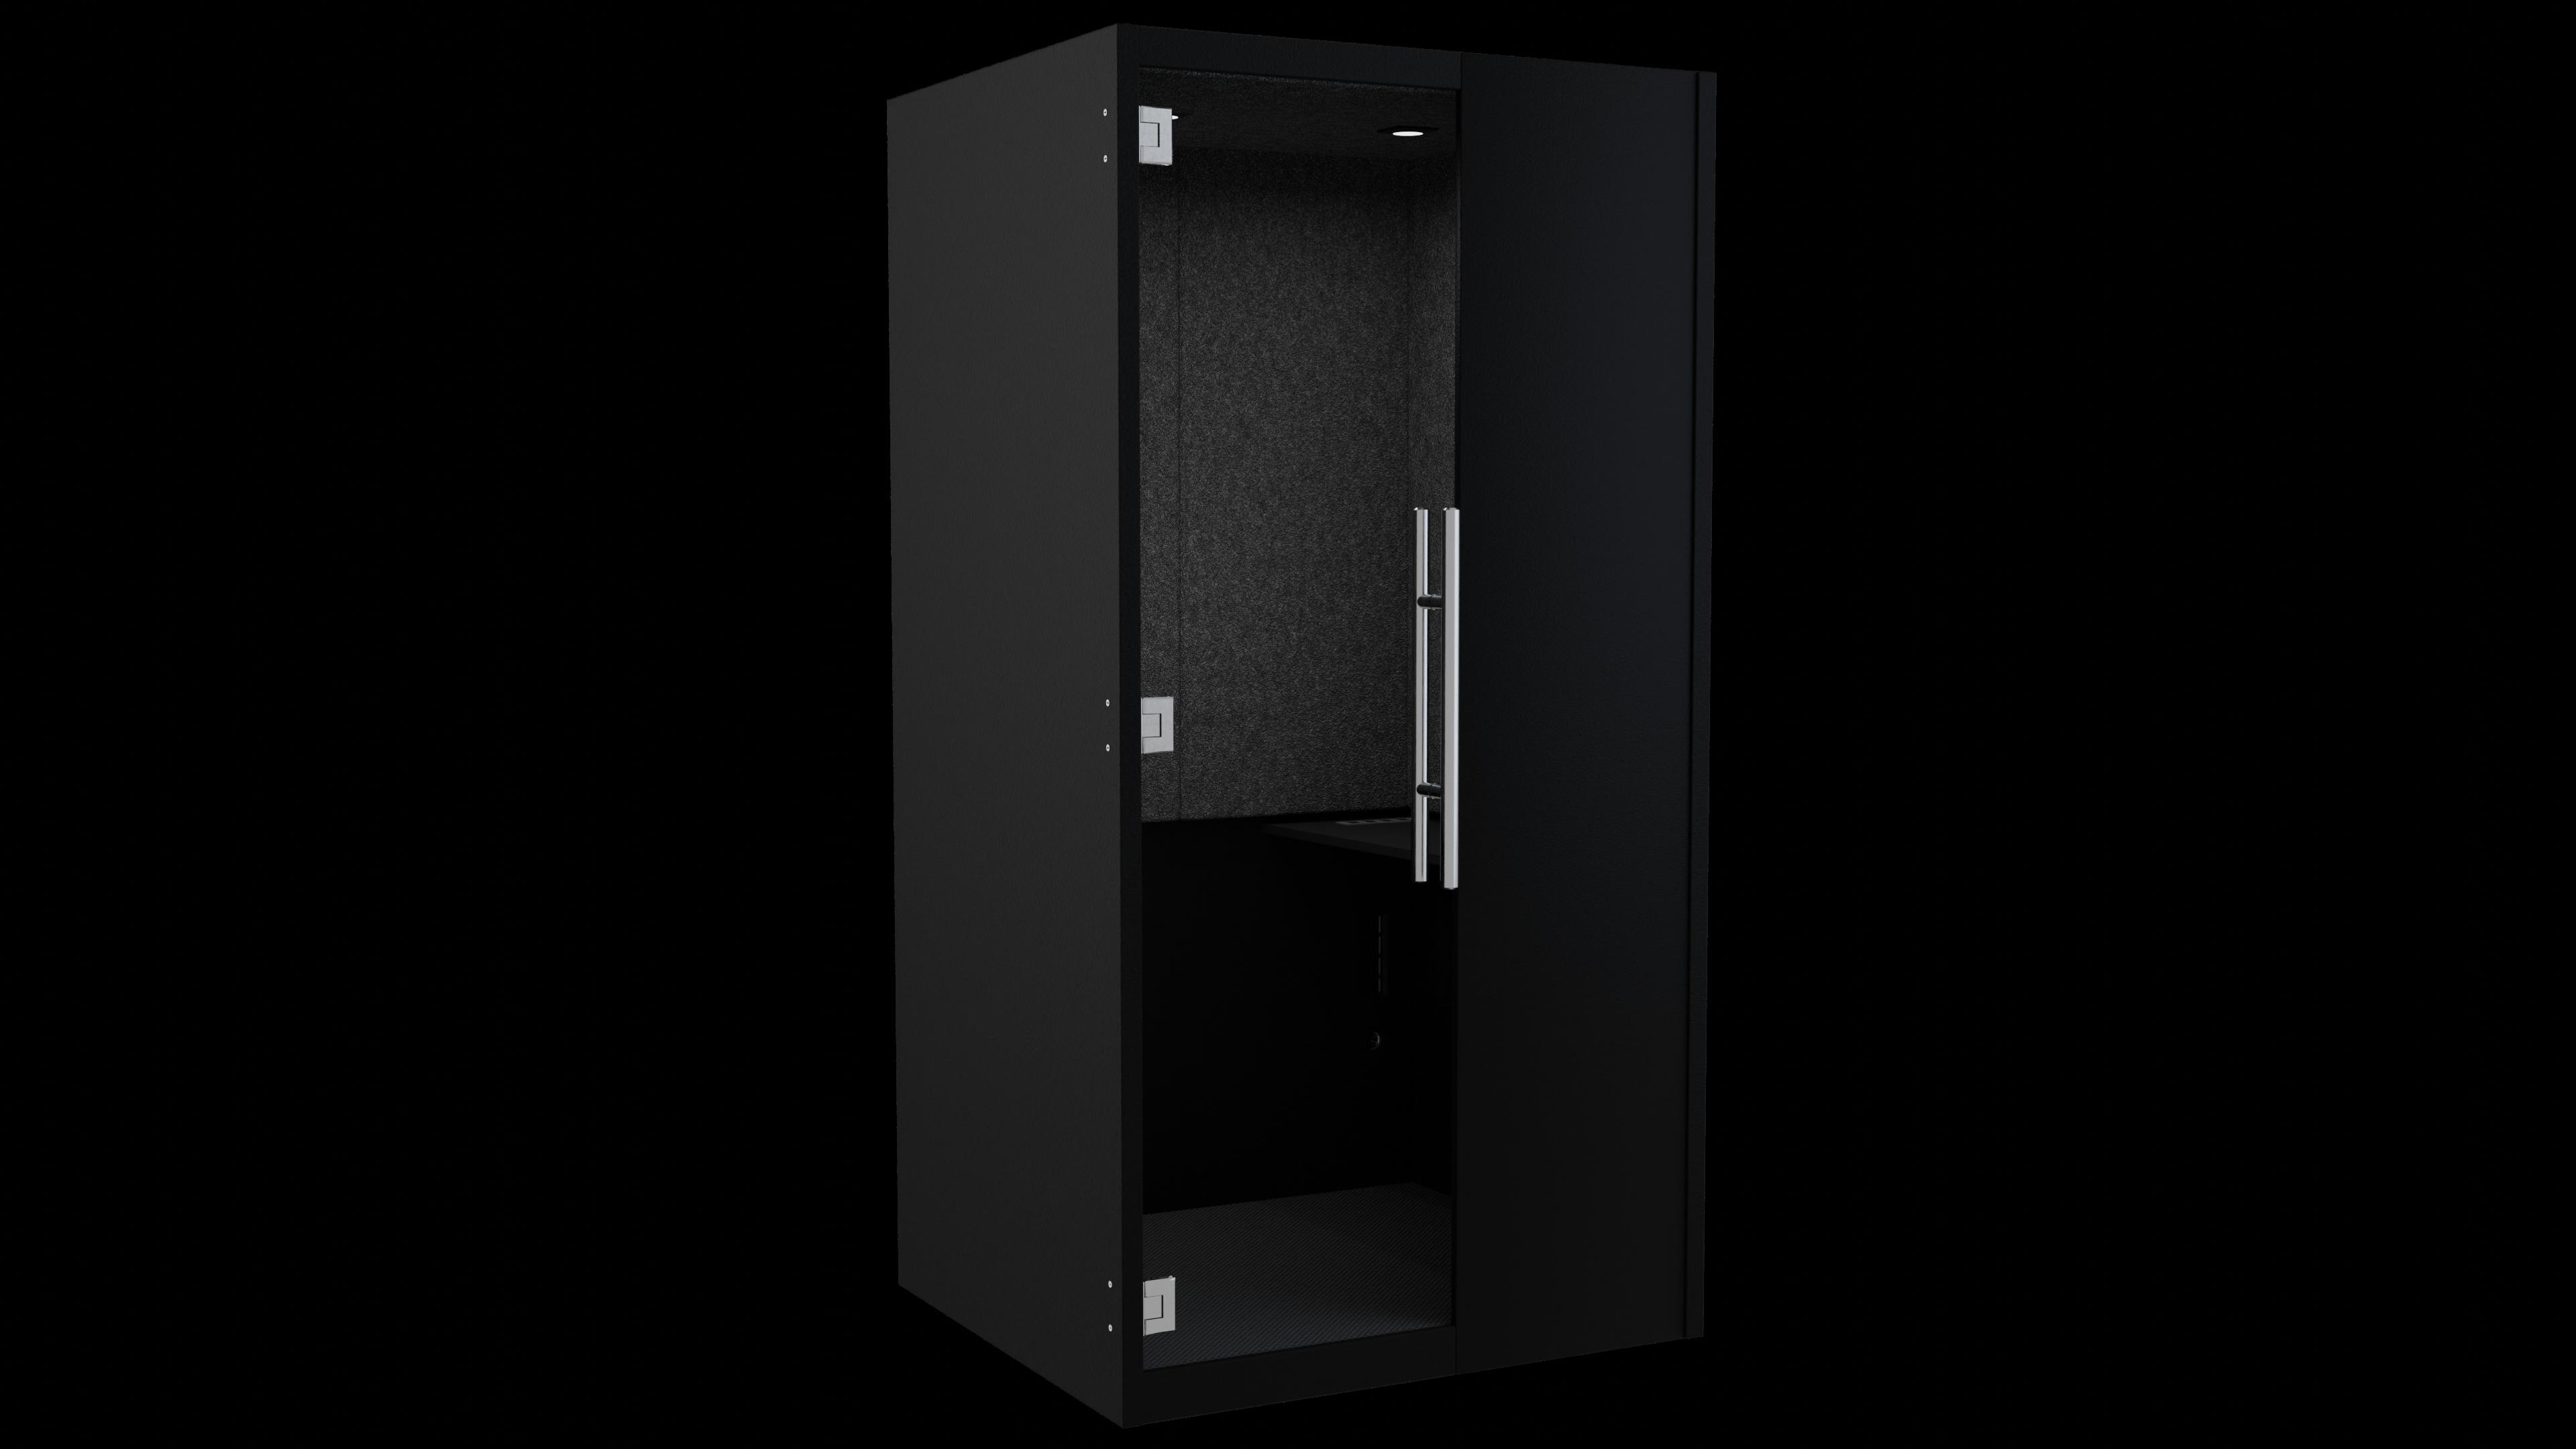 Black Laminate phoneBOX with Charcoal Felt